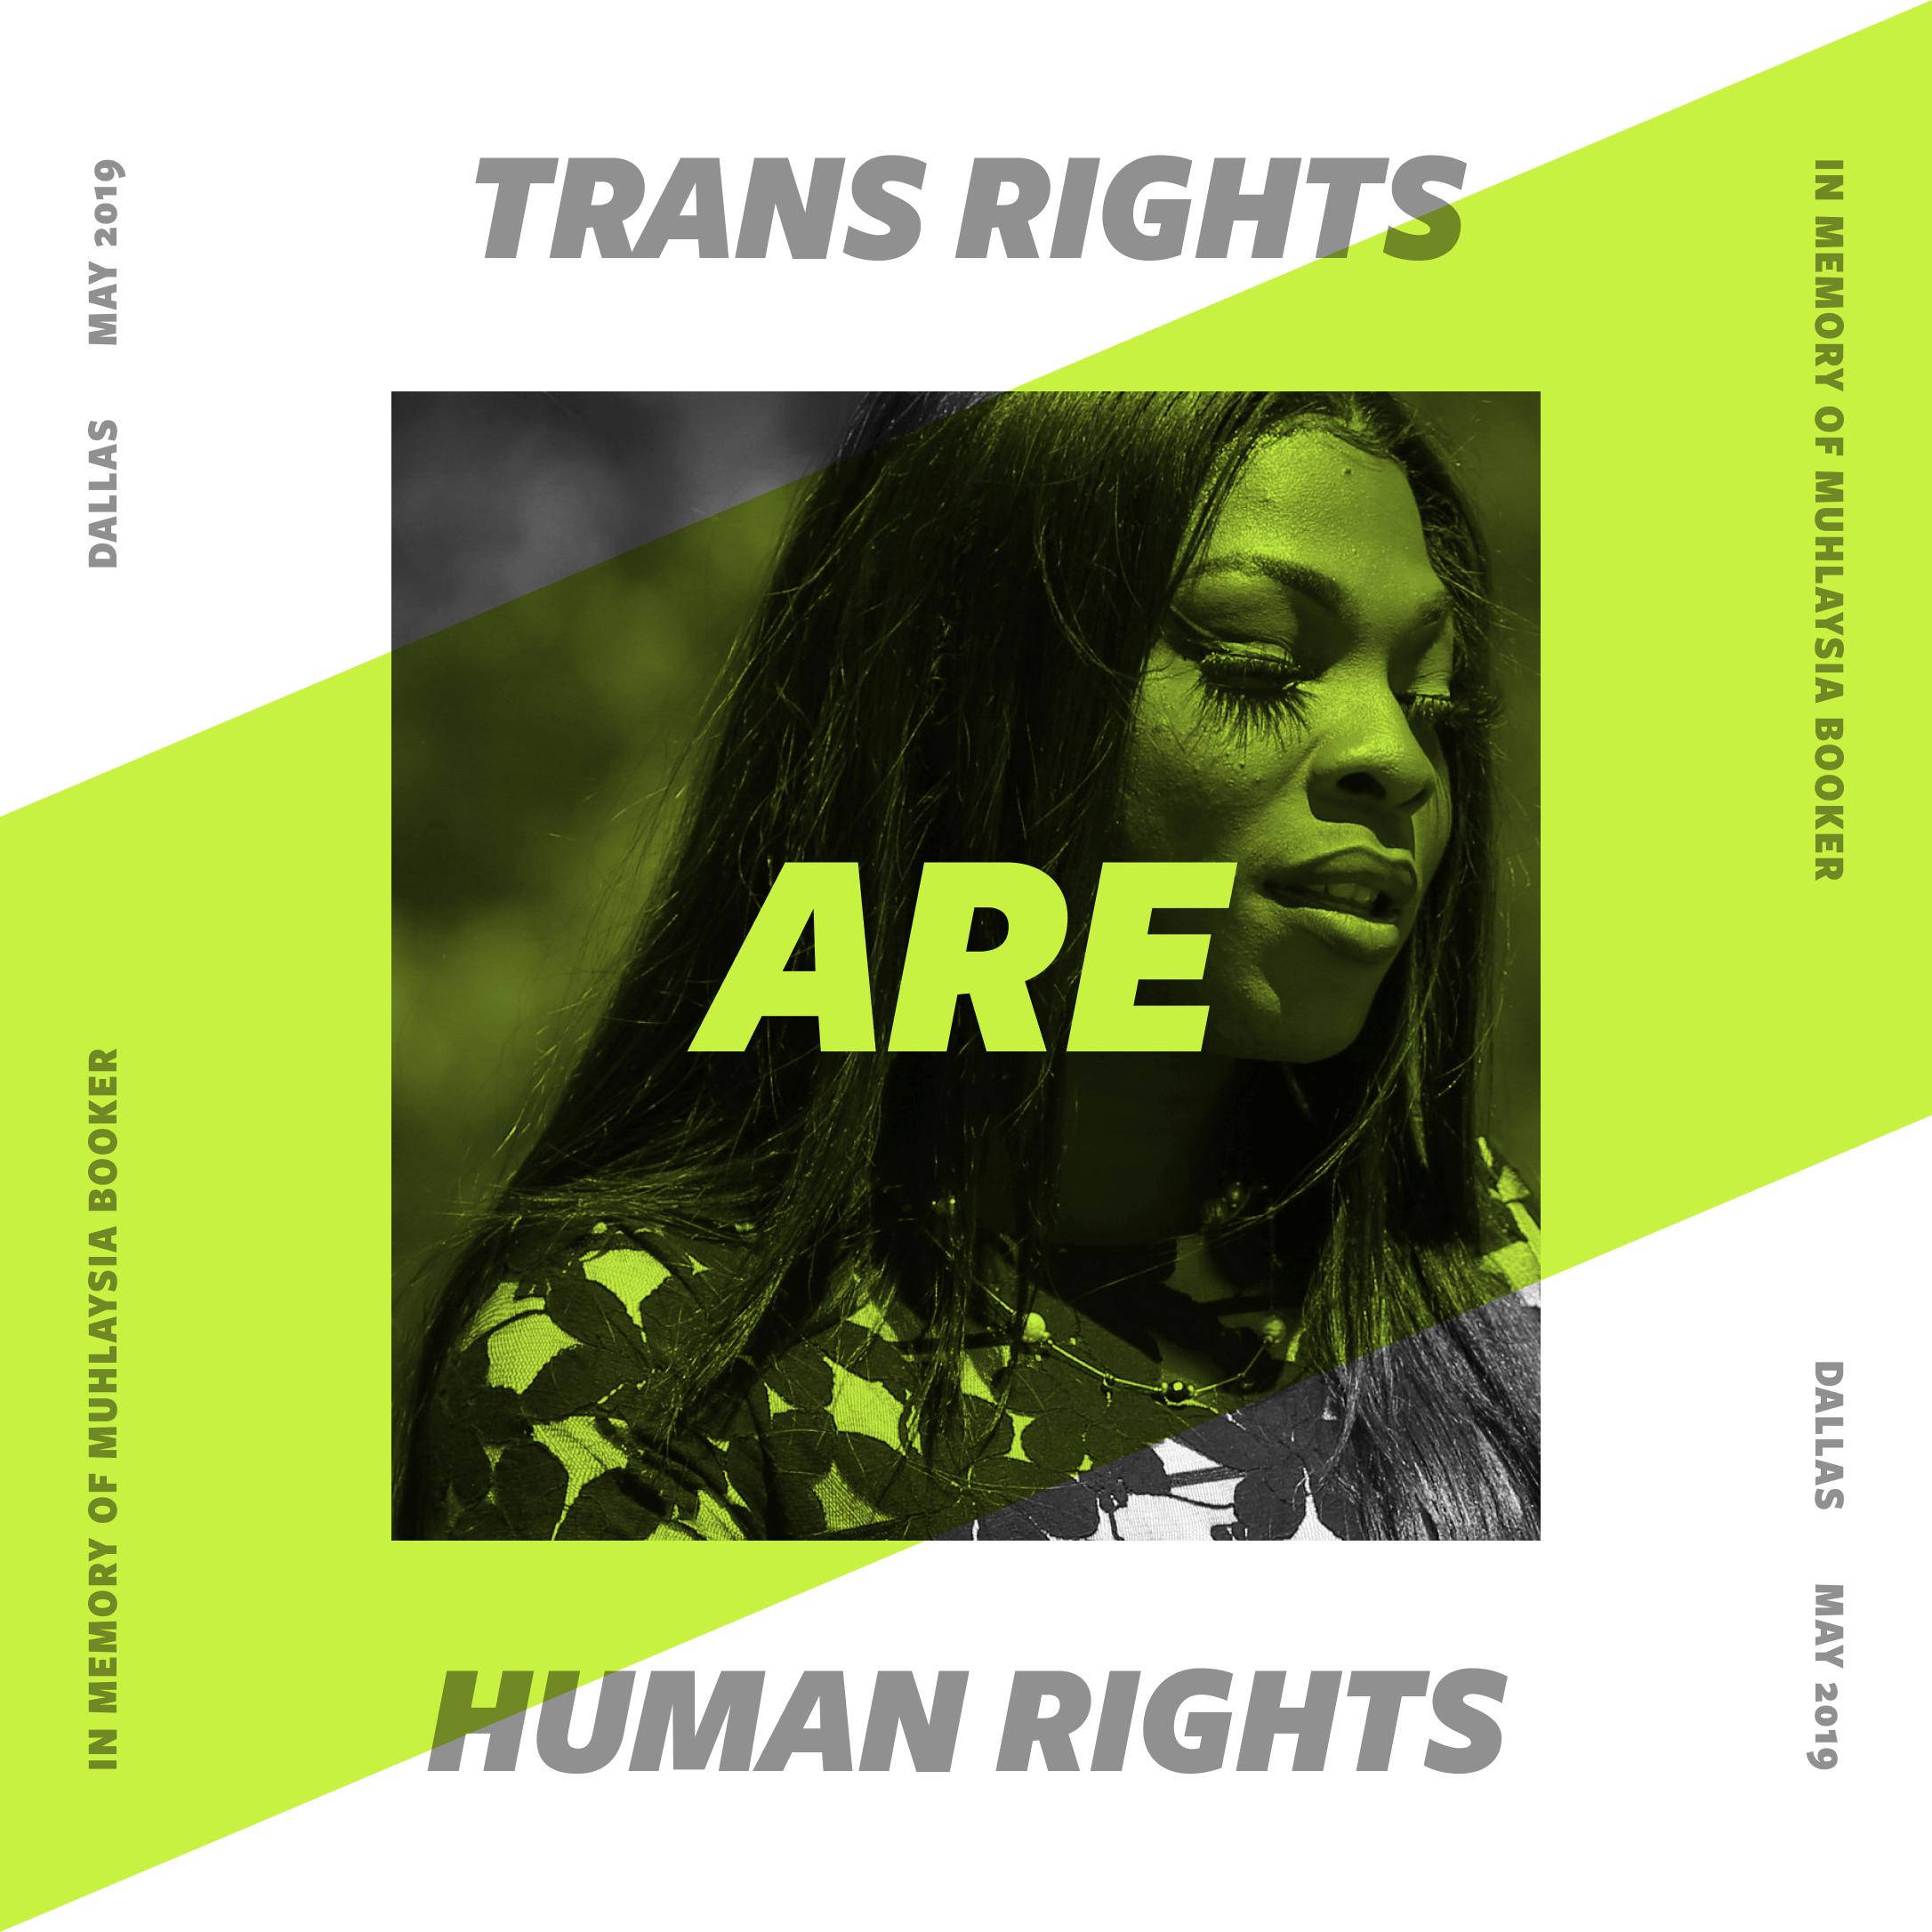 transrightshumanrights_protextmovement.png